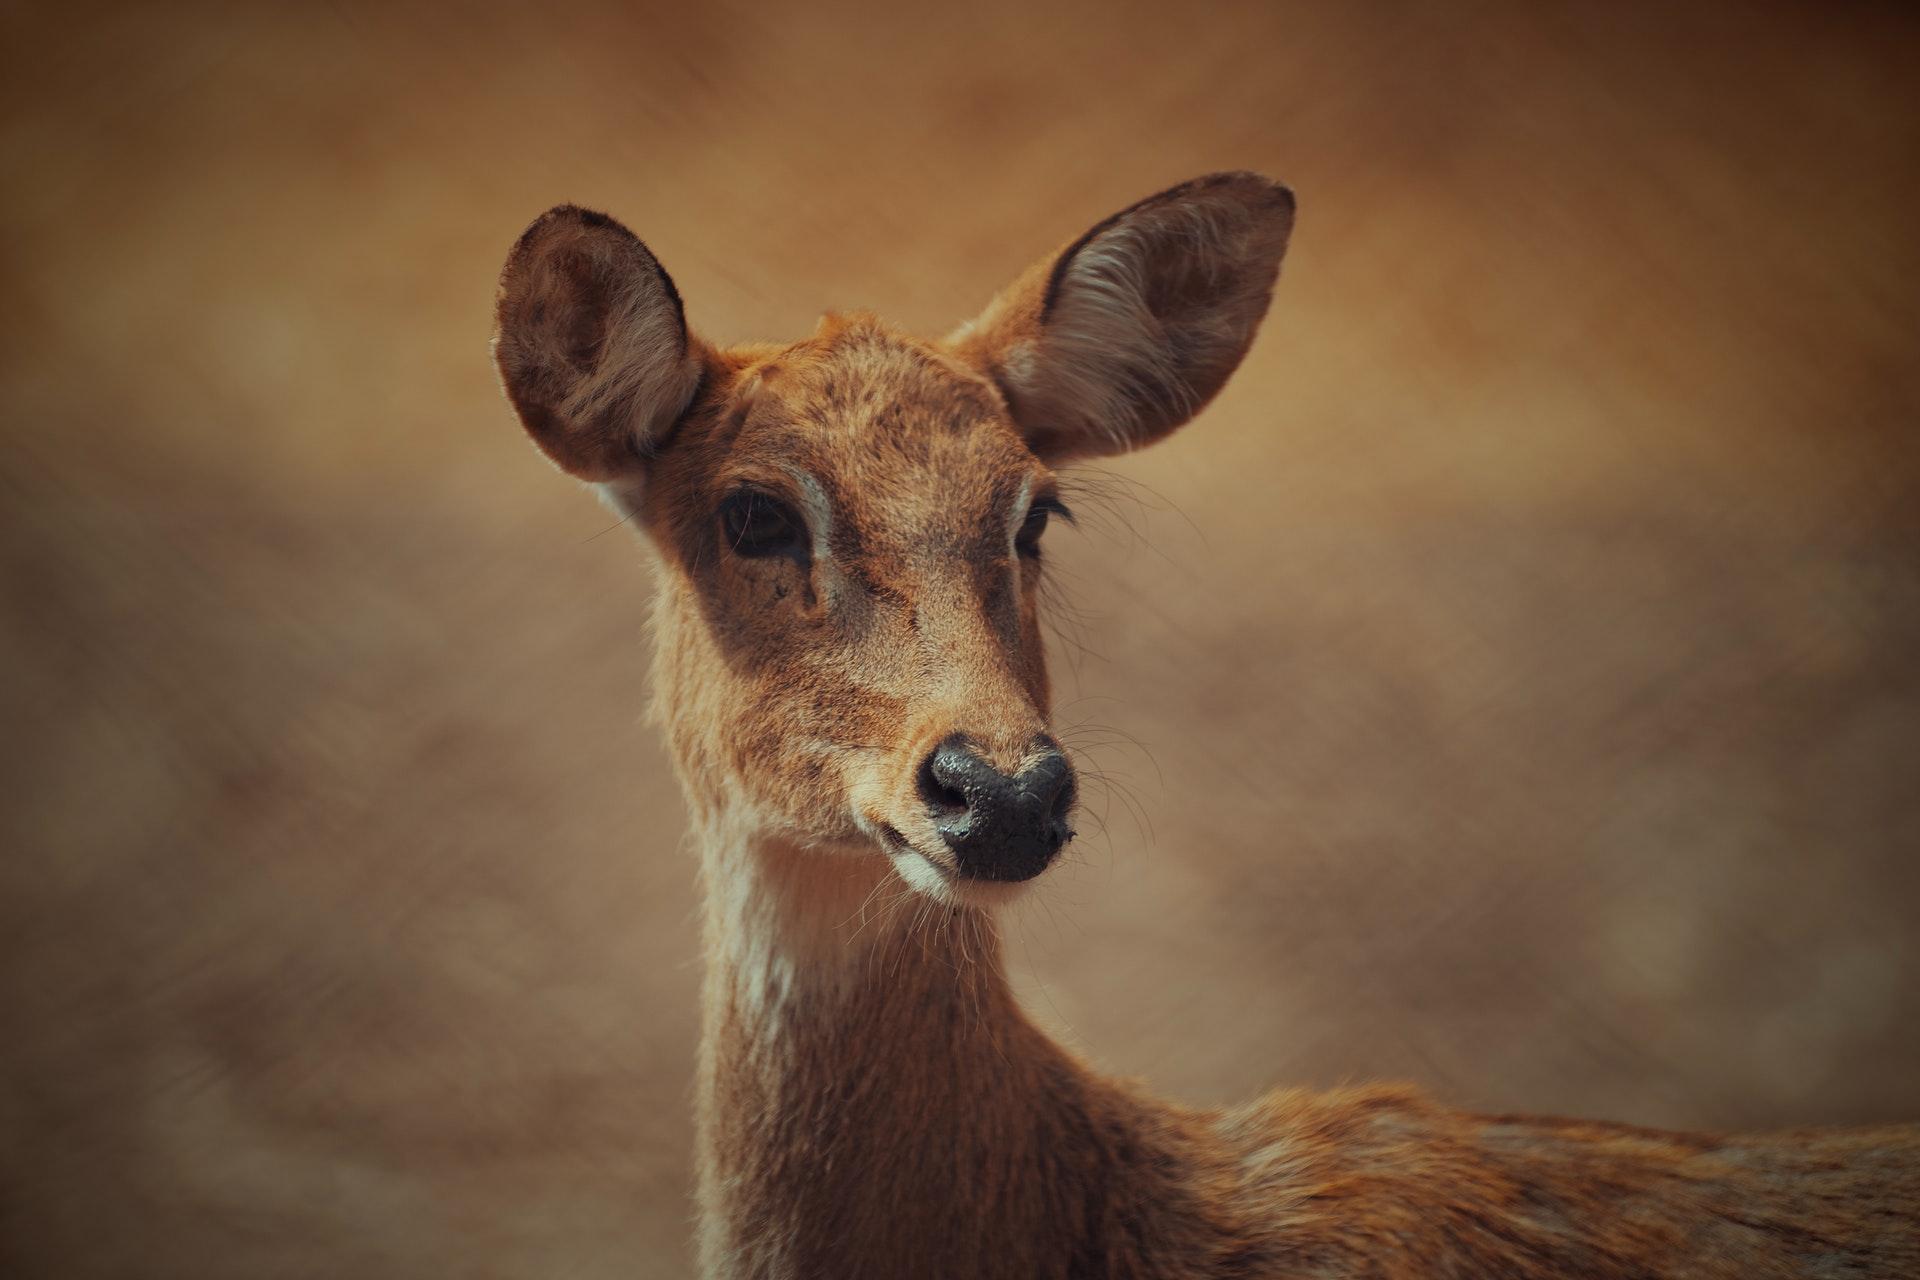 Pakistan Wildlife foundation